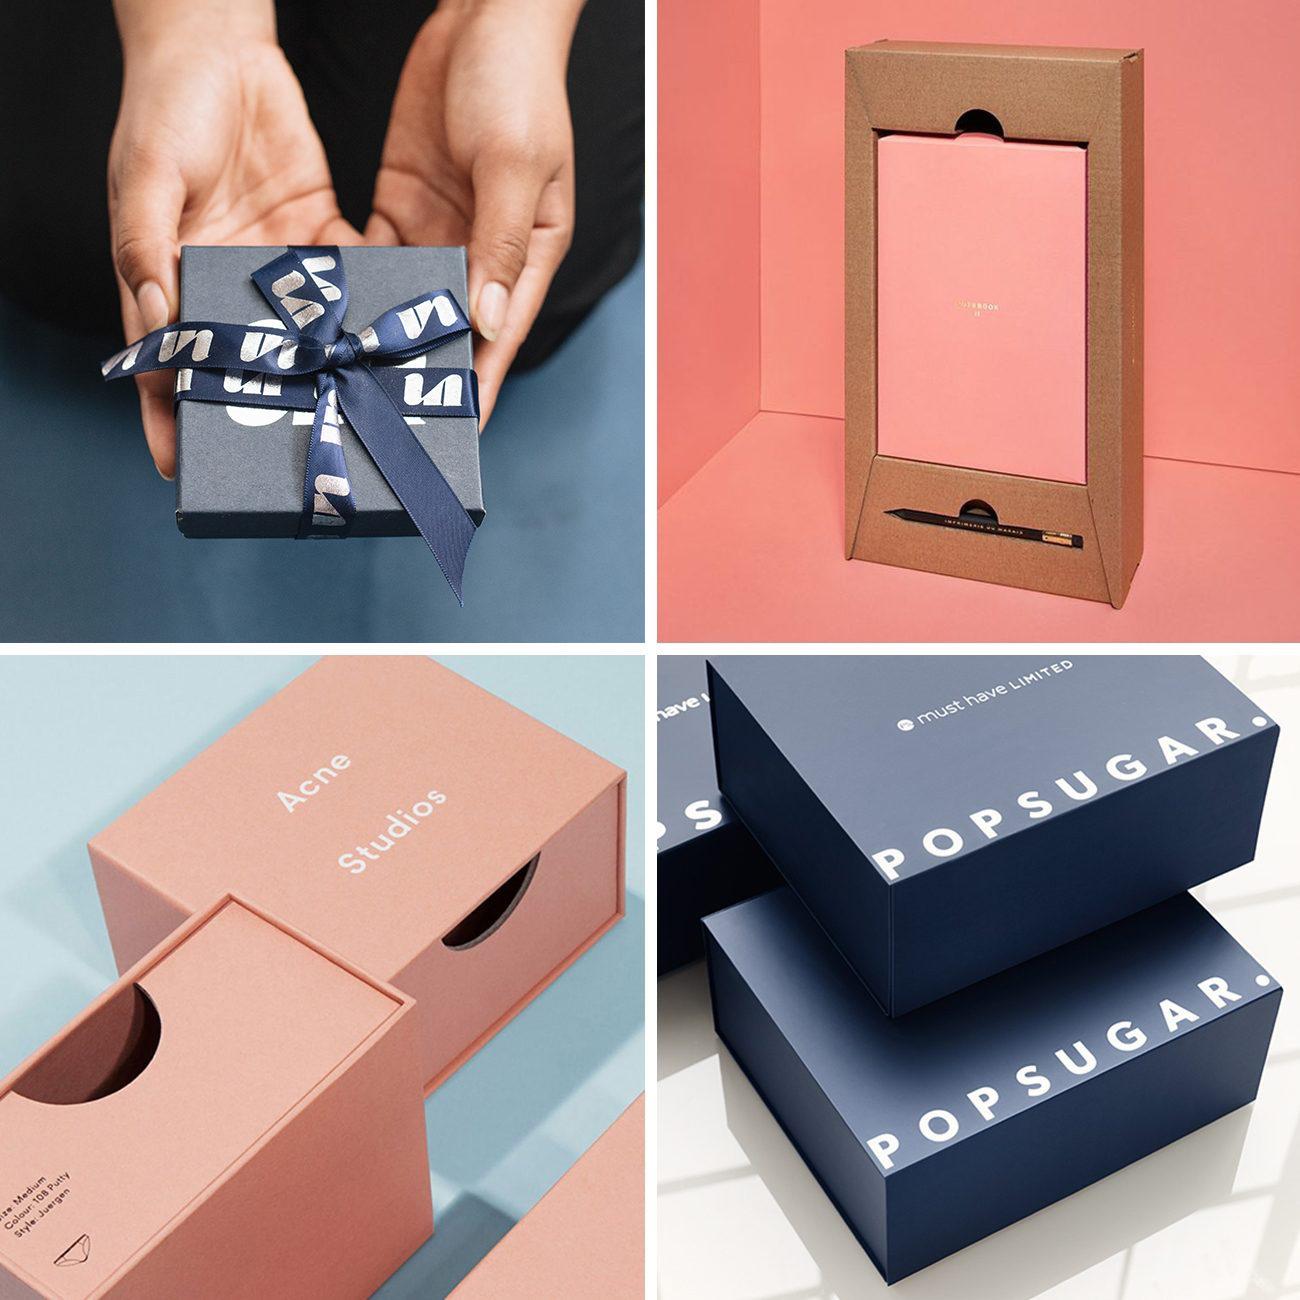 Photos via:Mary Rabun, Lumi,Acne Studios,Popsugar 70 Ideas to Spruce Up Your Holiday Packaging Design